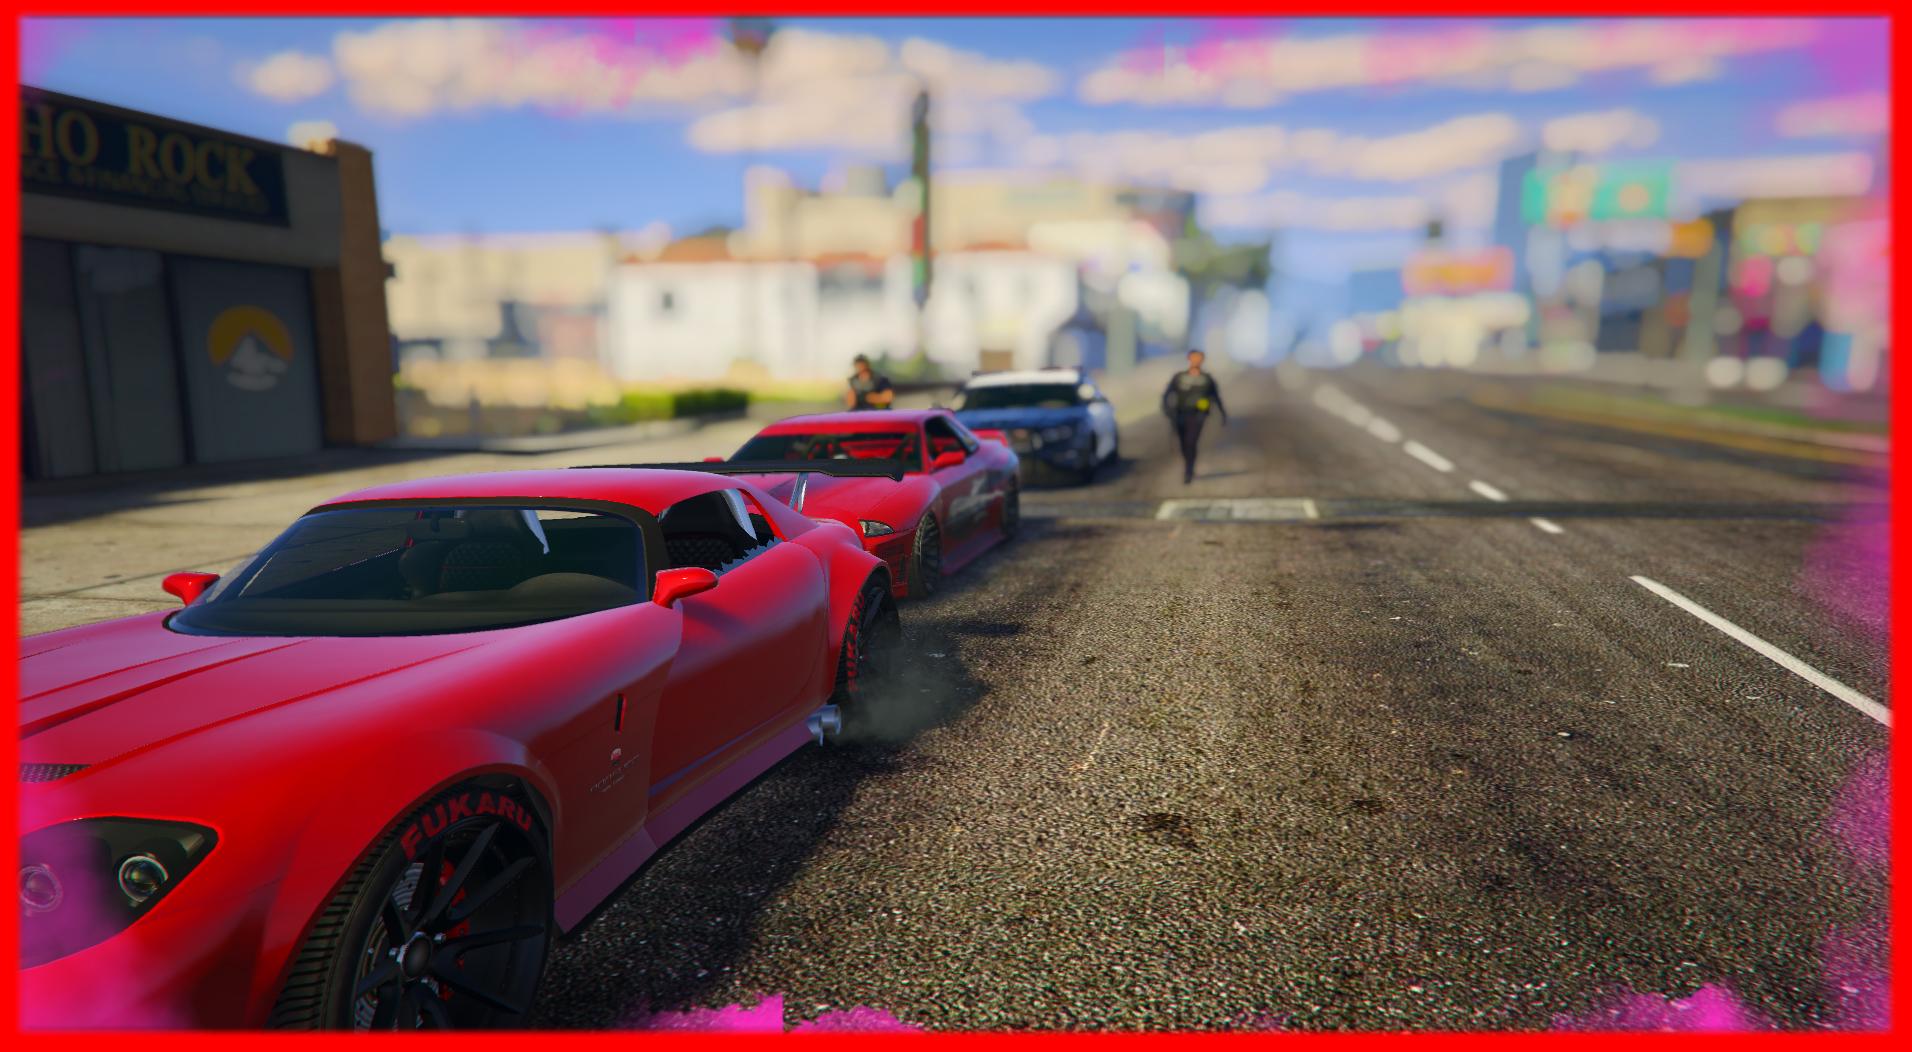 Grand_Theft_Auto_V_Screenshot_2021.02.27_-_22.08.jpg